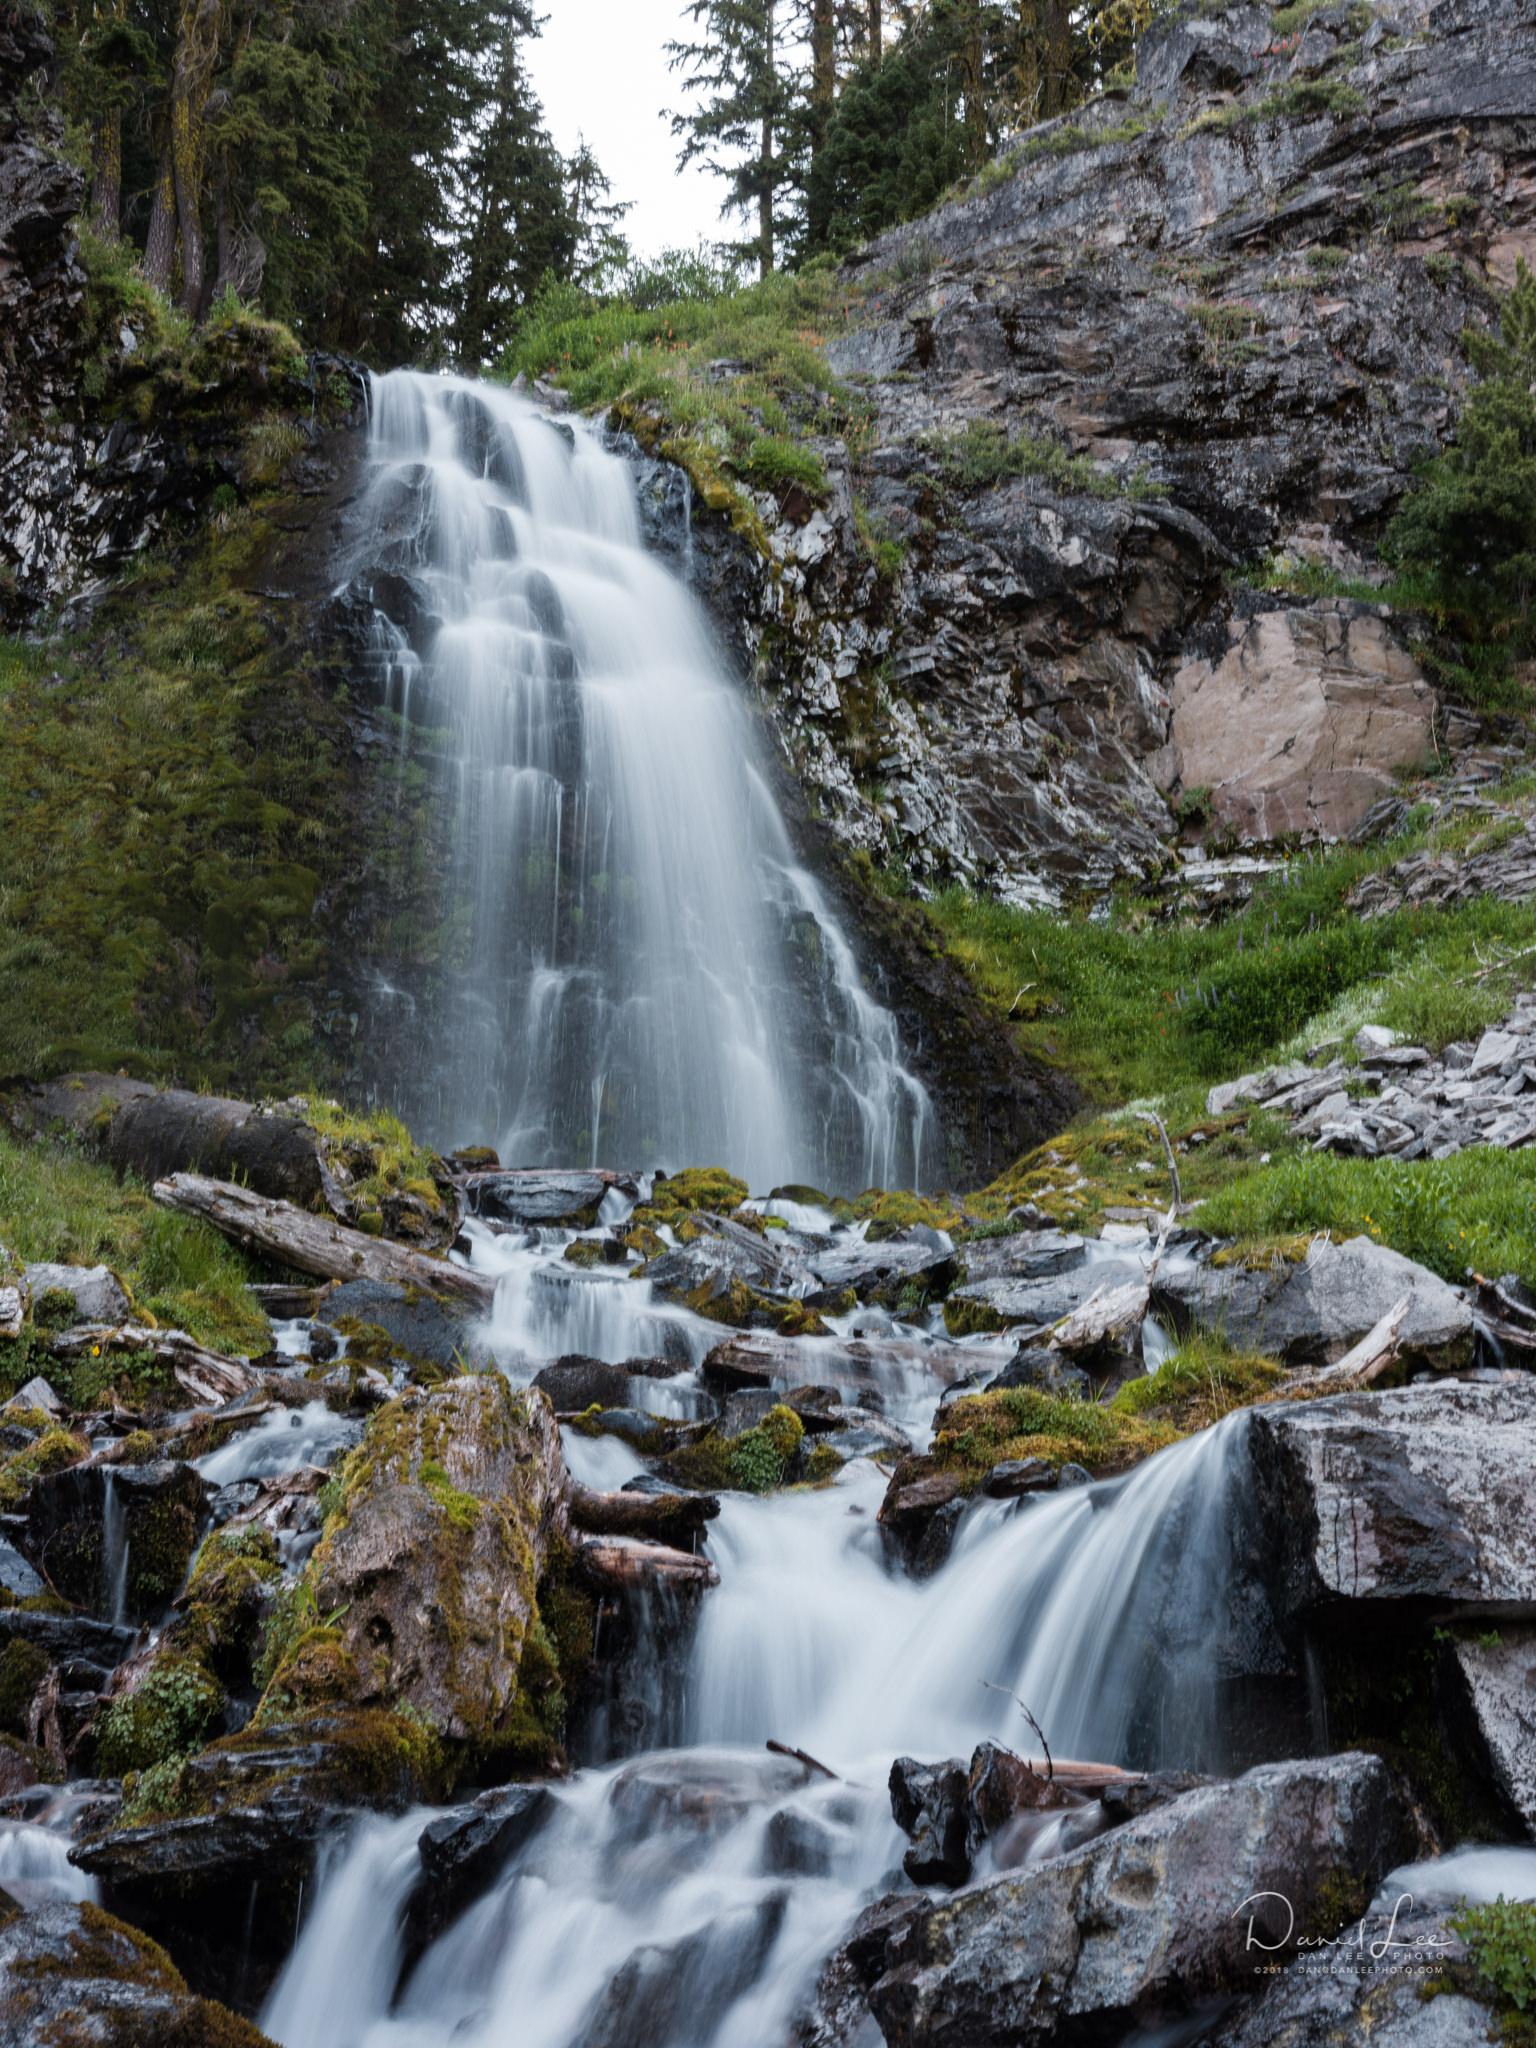 Plaikni Falls in Crater Lake National Park. Photo by Daniel Lee.